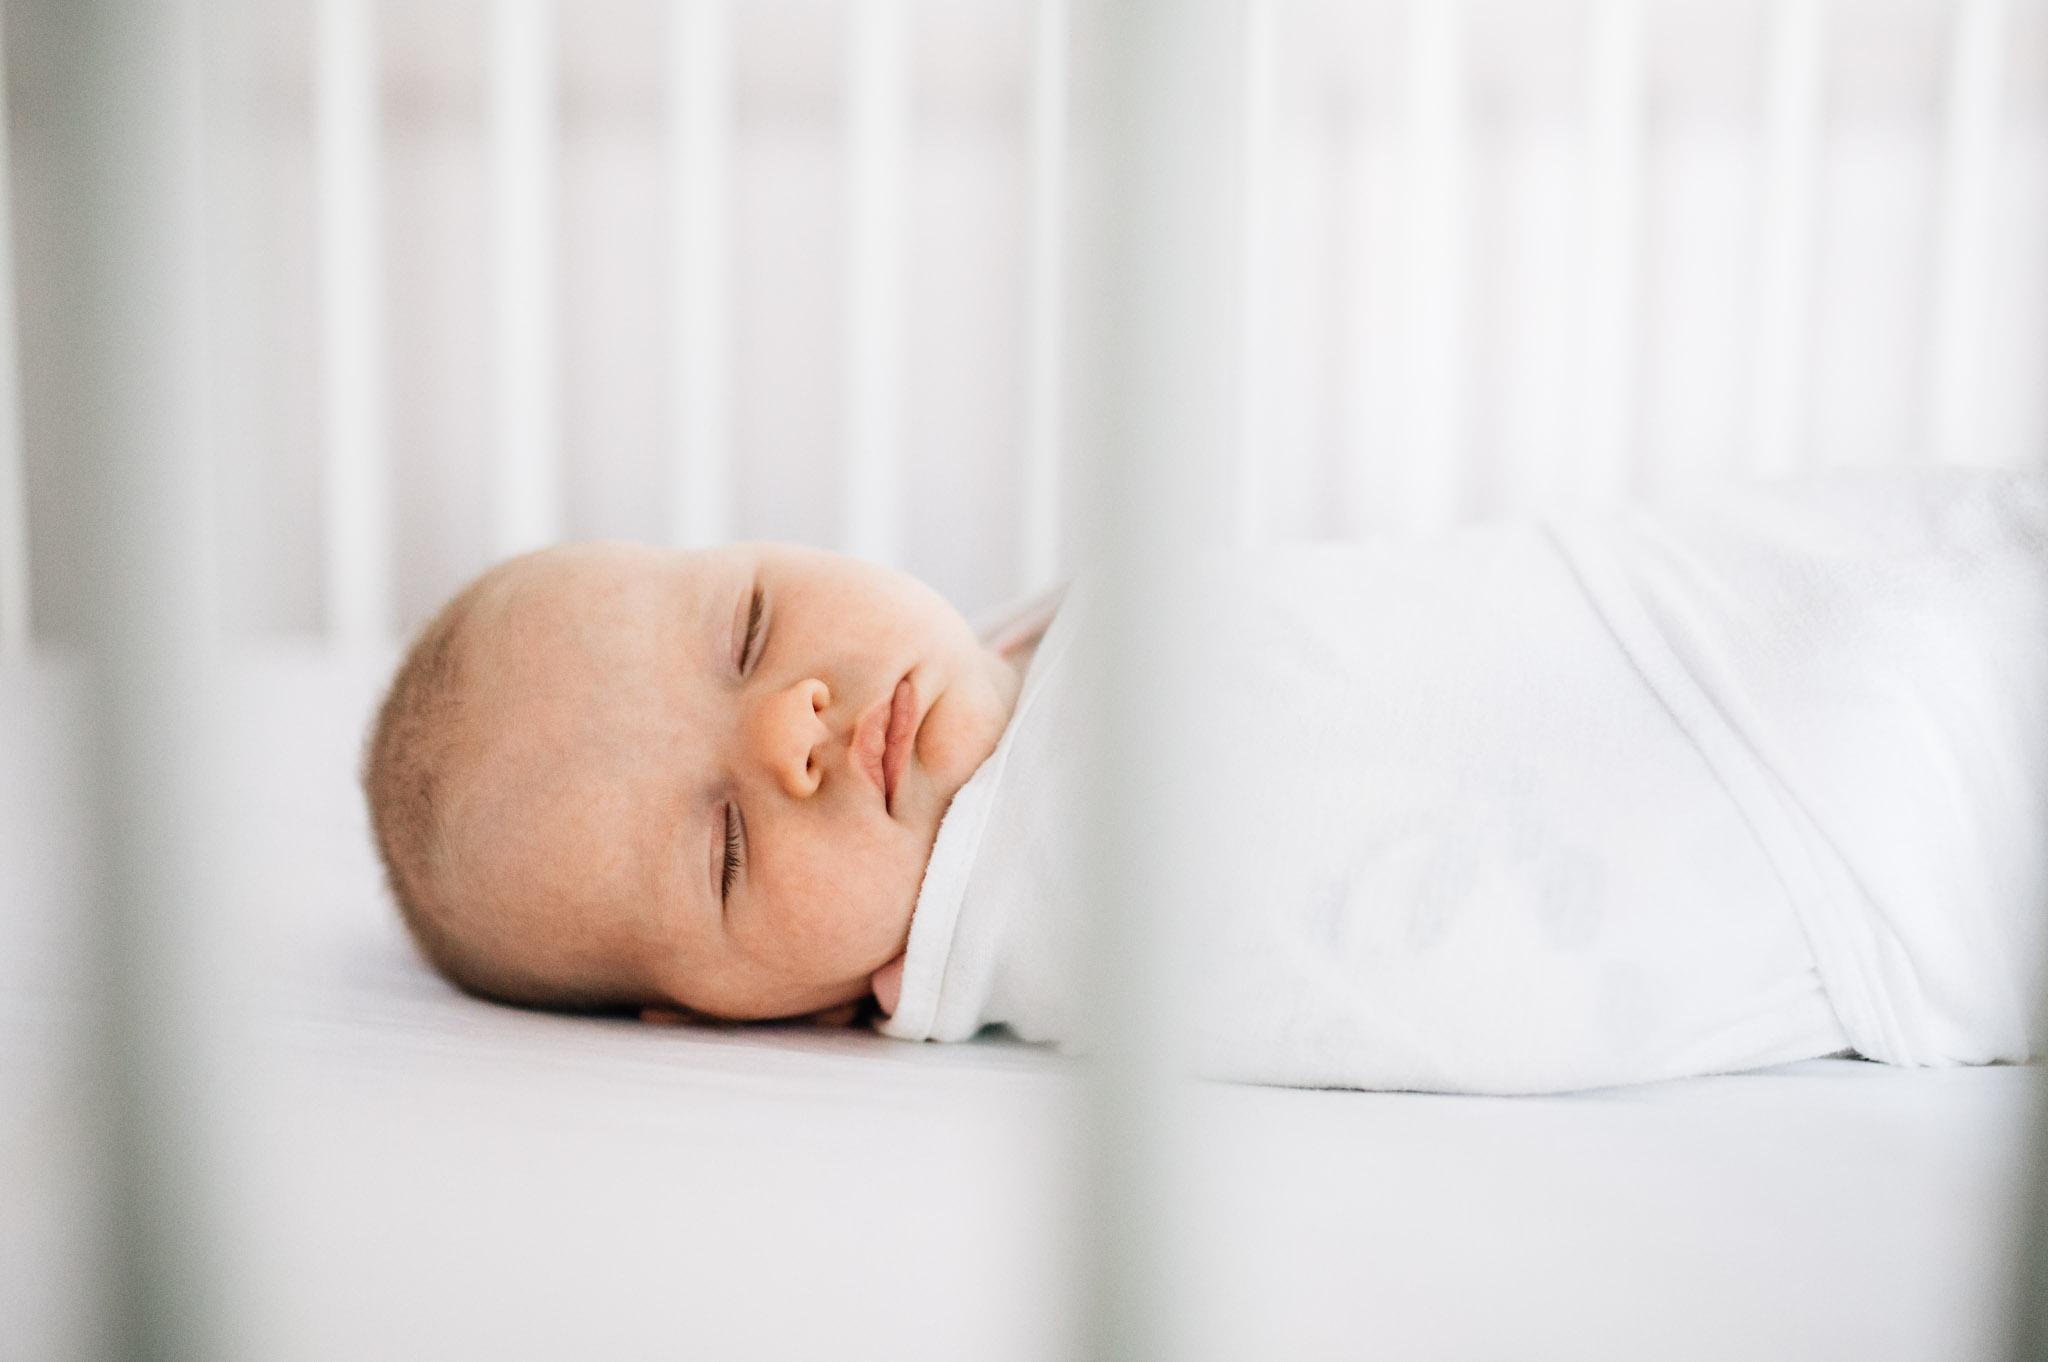 swaddled-baby-sleeping-in-crib (1 of 1).jpg